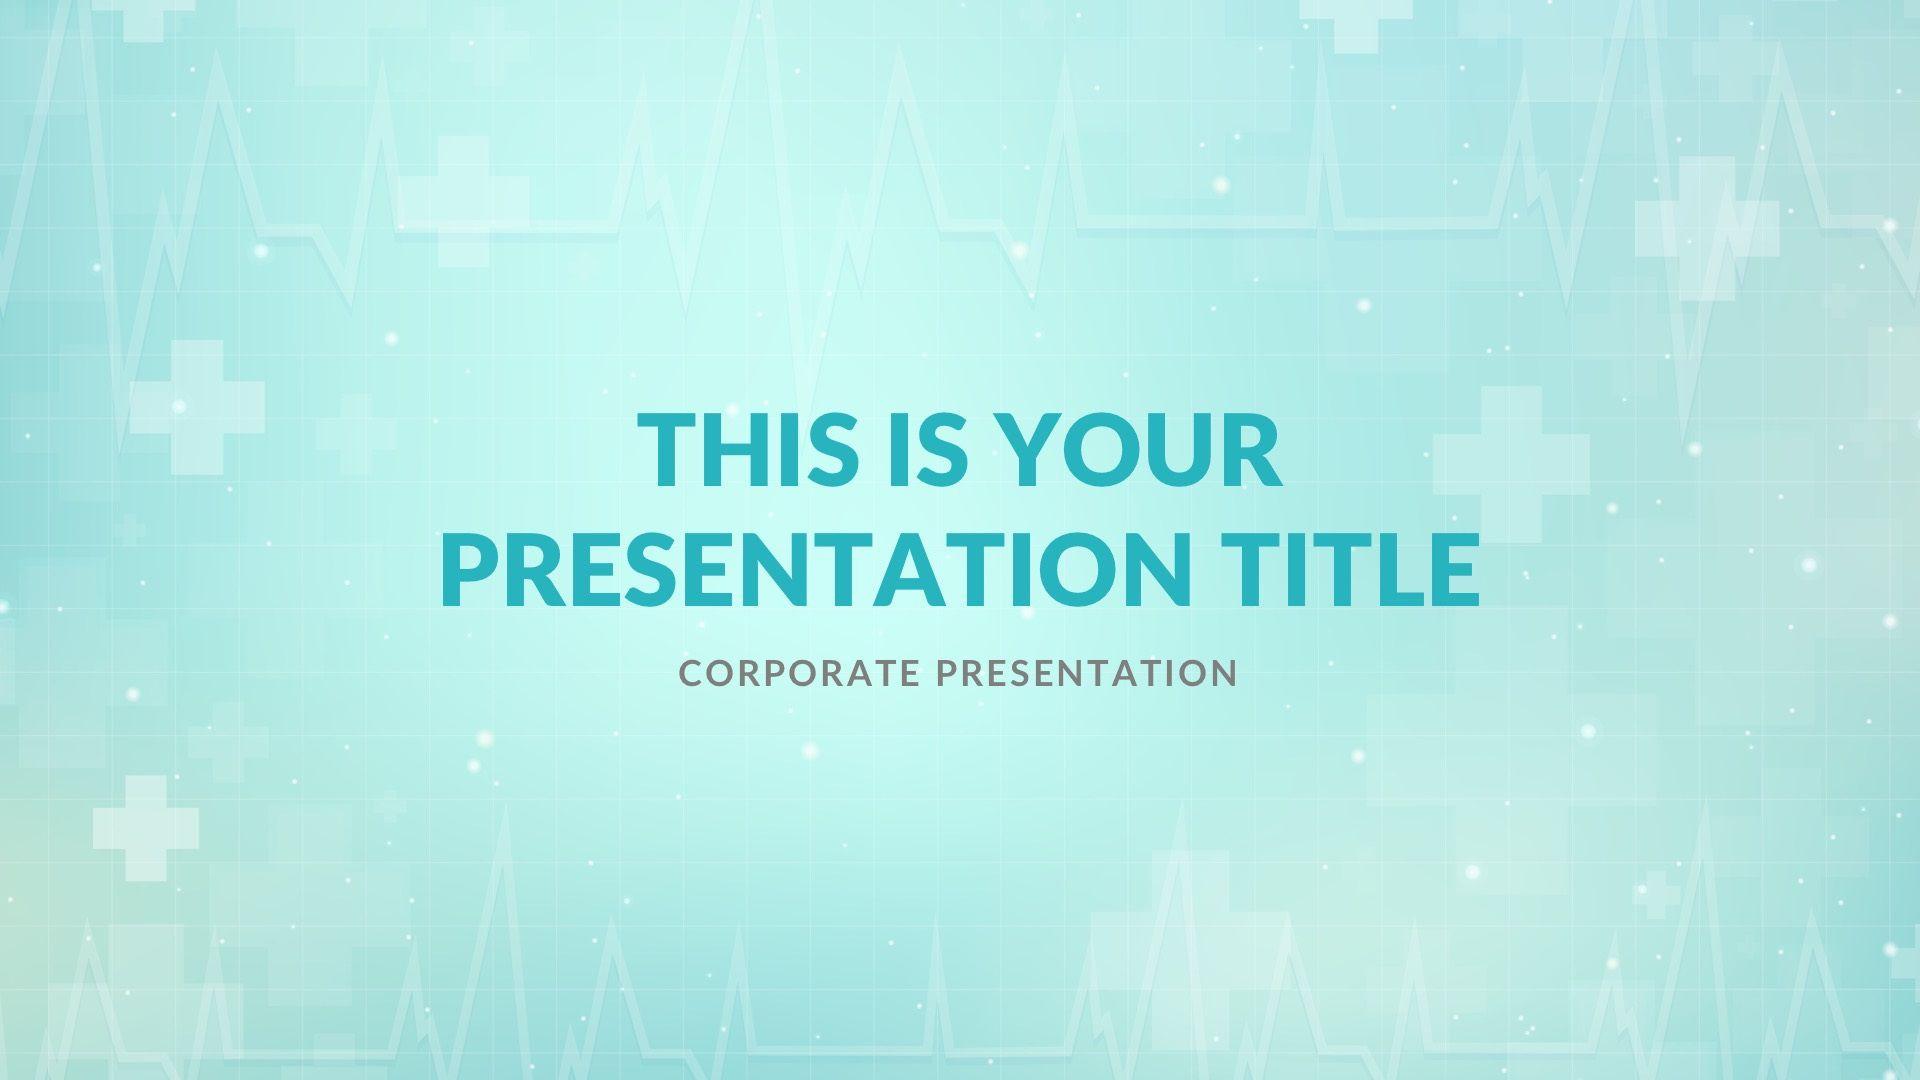 002 Imposing Powerpoint Presentation Template Free Download Medical Photo  AnimatedFull